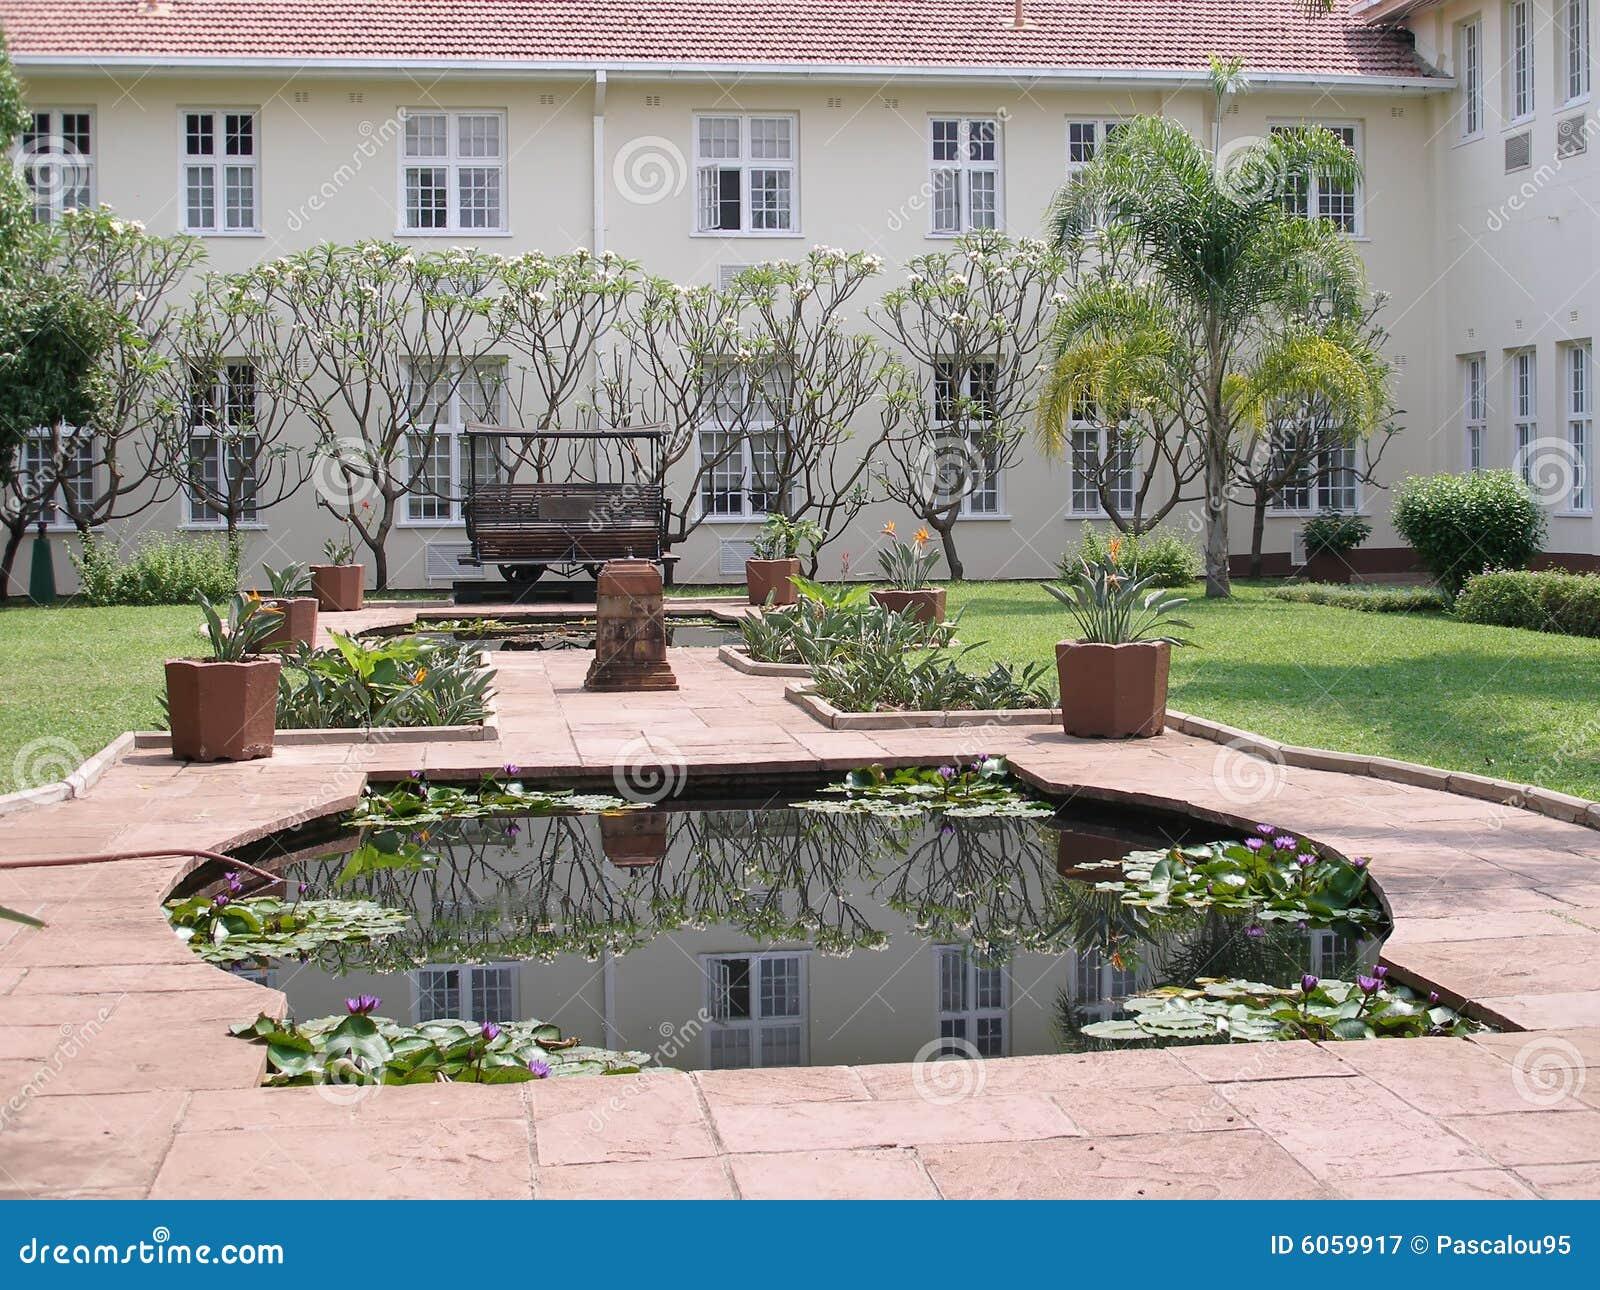 Gardens royalty free stock photography image 6059917 for Garden design zimbabwe